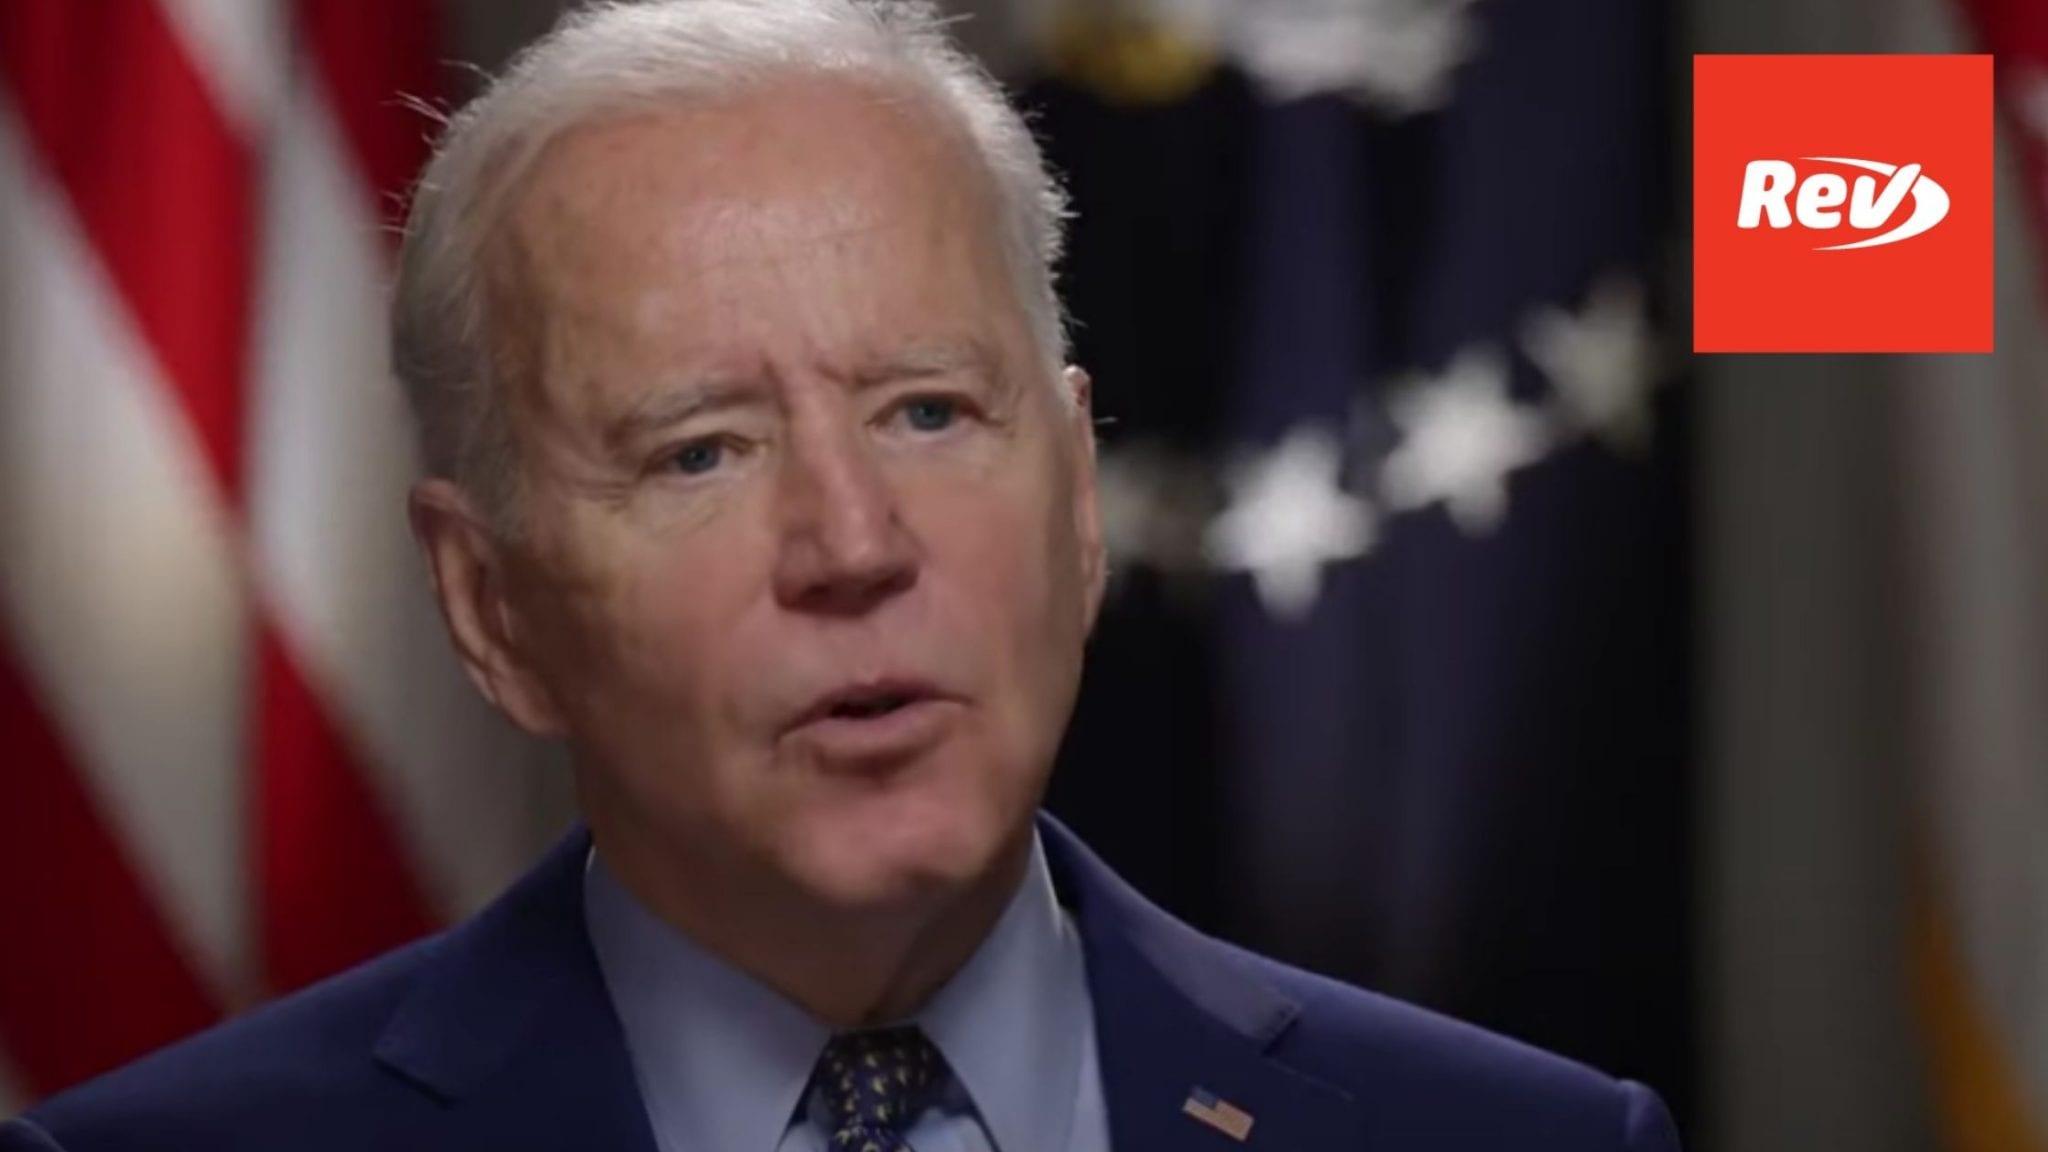 Joe Biden NBC TODAY Interview Transcript: Spending, COVID-19 Pandemic, Immigration